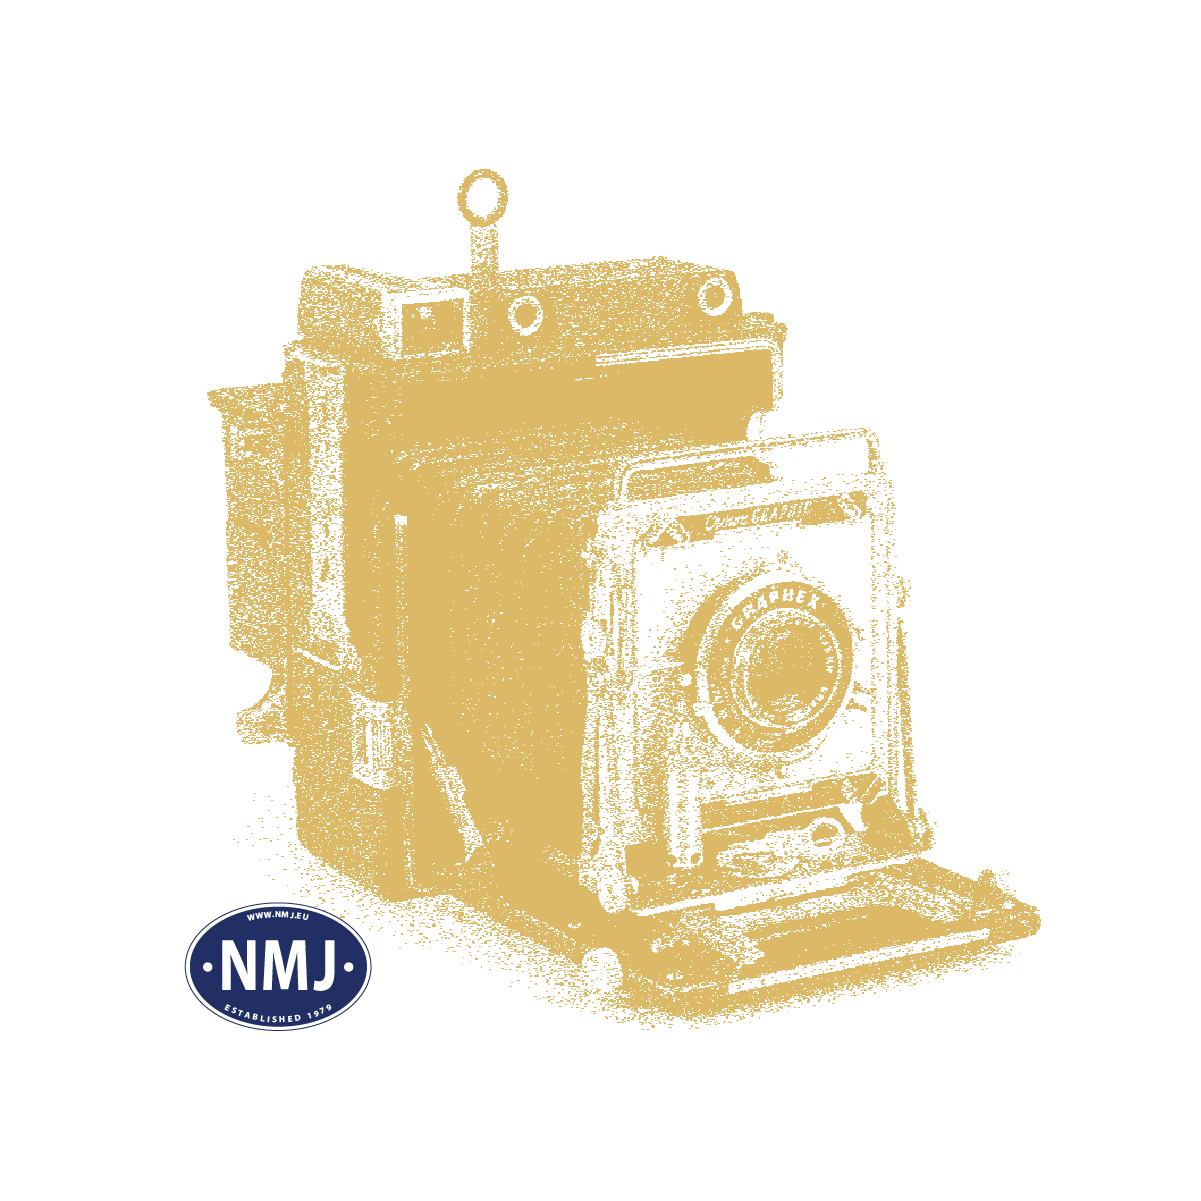 MIN737-21S - To-fargede Gresstuster, Vår, H0